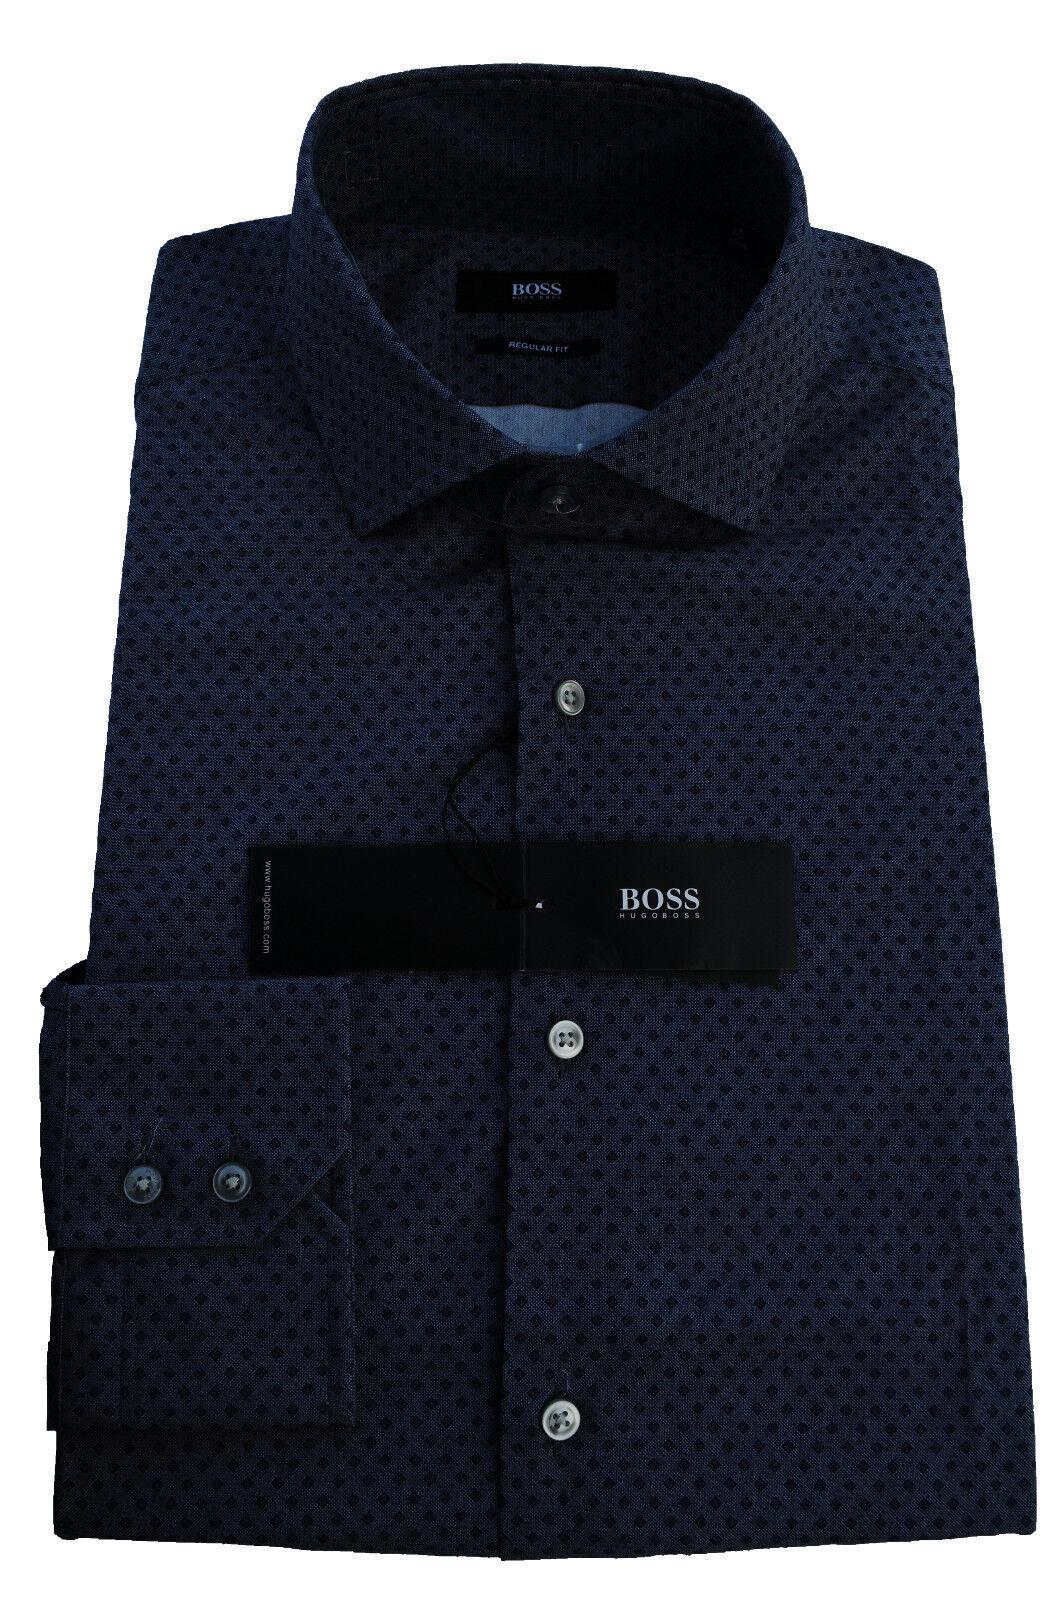 NEU gr. 40 HUGO BOSS HEMD GORDON REGULAR FIT NAVY zu Jeans 50284814